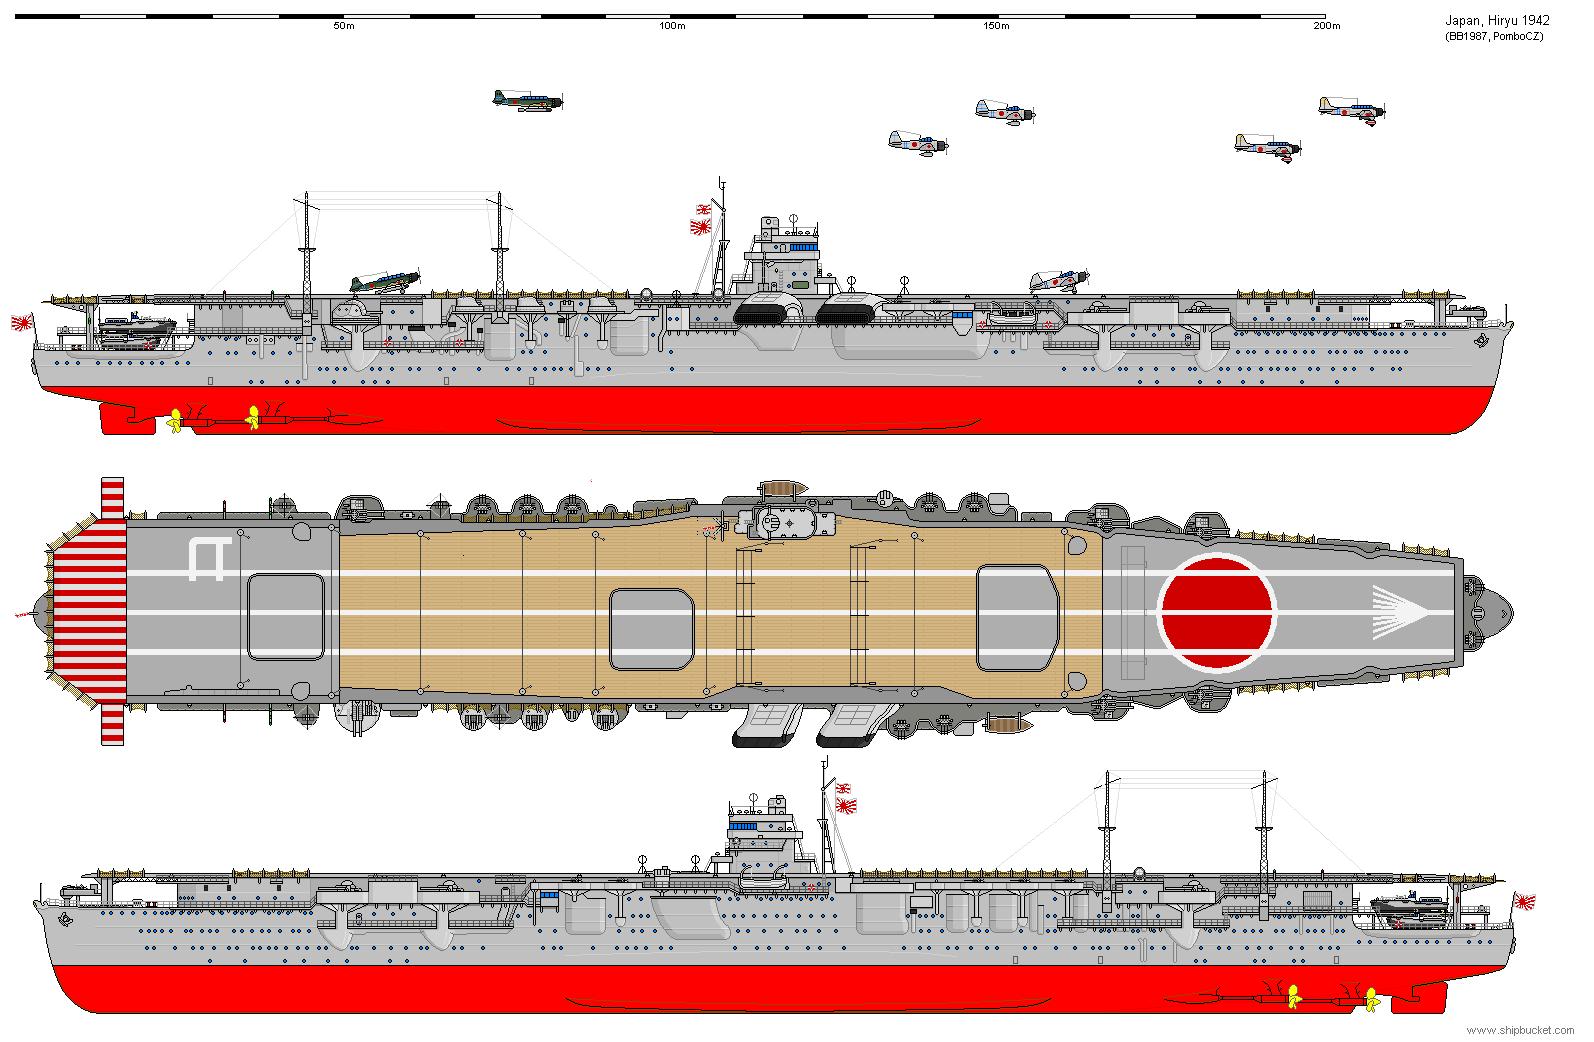 Real Designs Japan Cv Hiryu 1942 Png Aircraft Carrier Imperial Japanese Navy Navy Ships